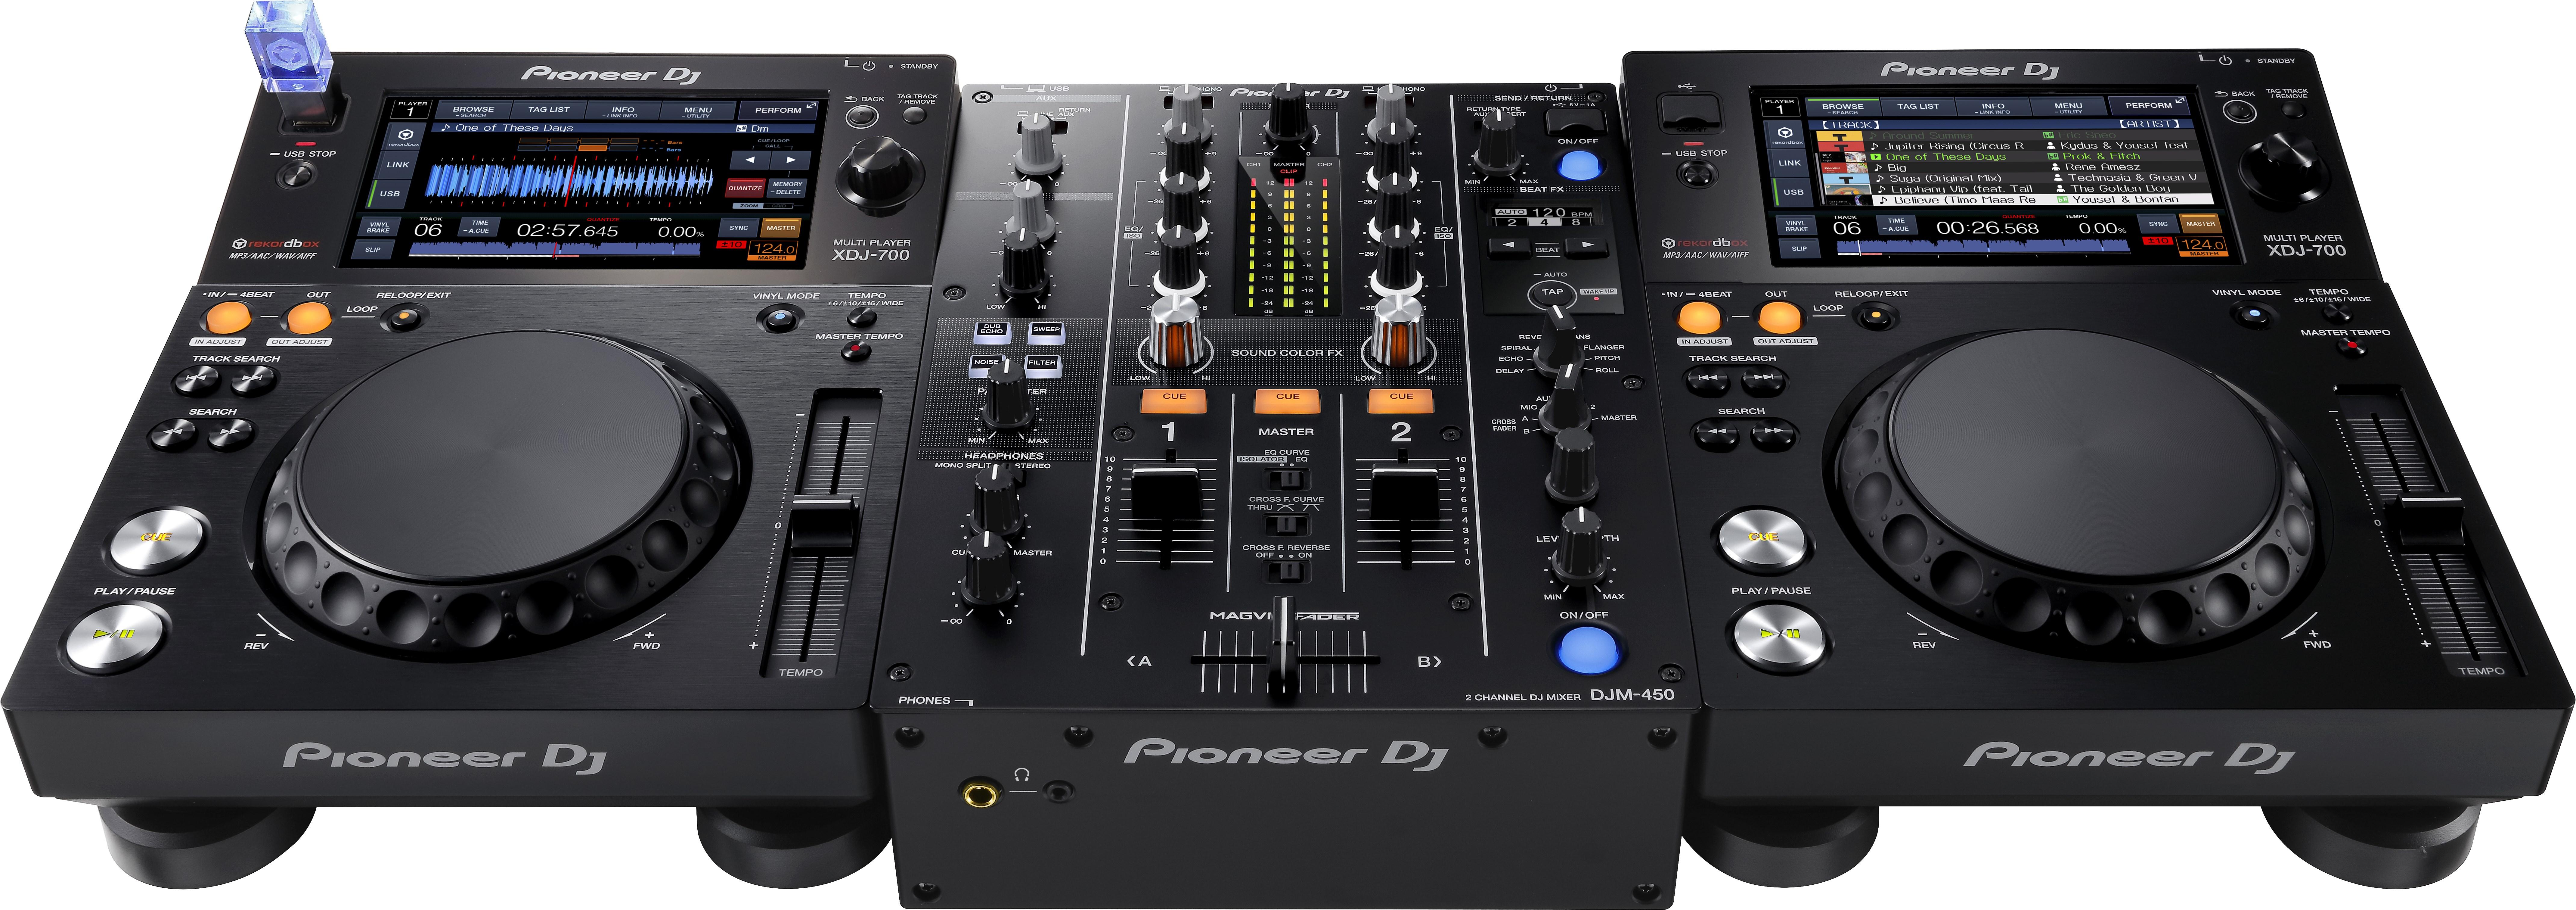 DJM-450 - XDJ-700